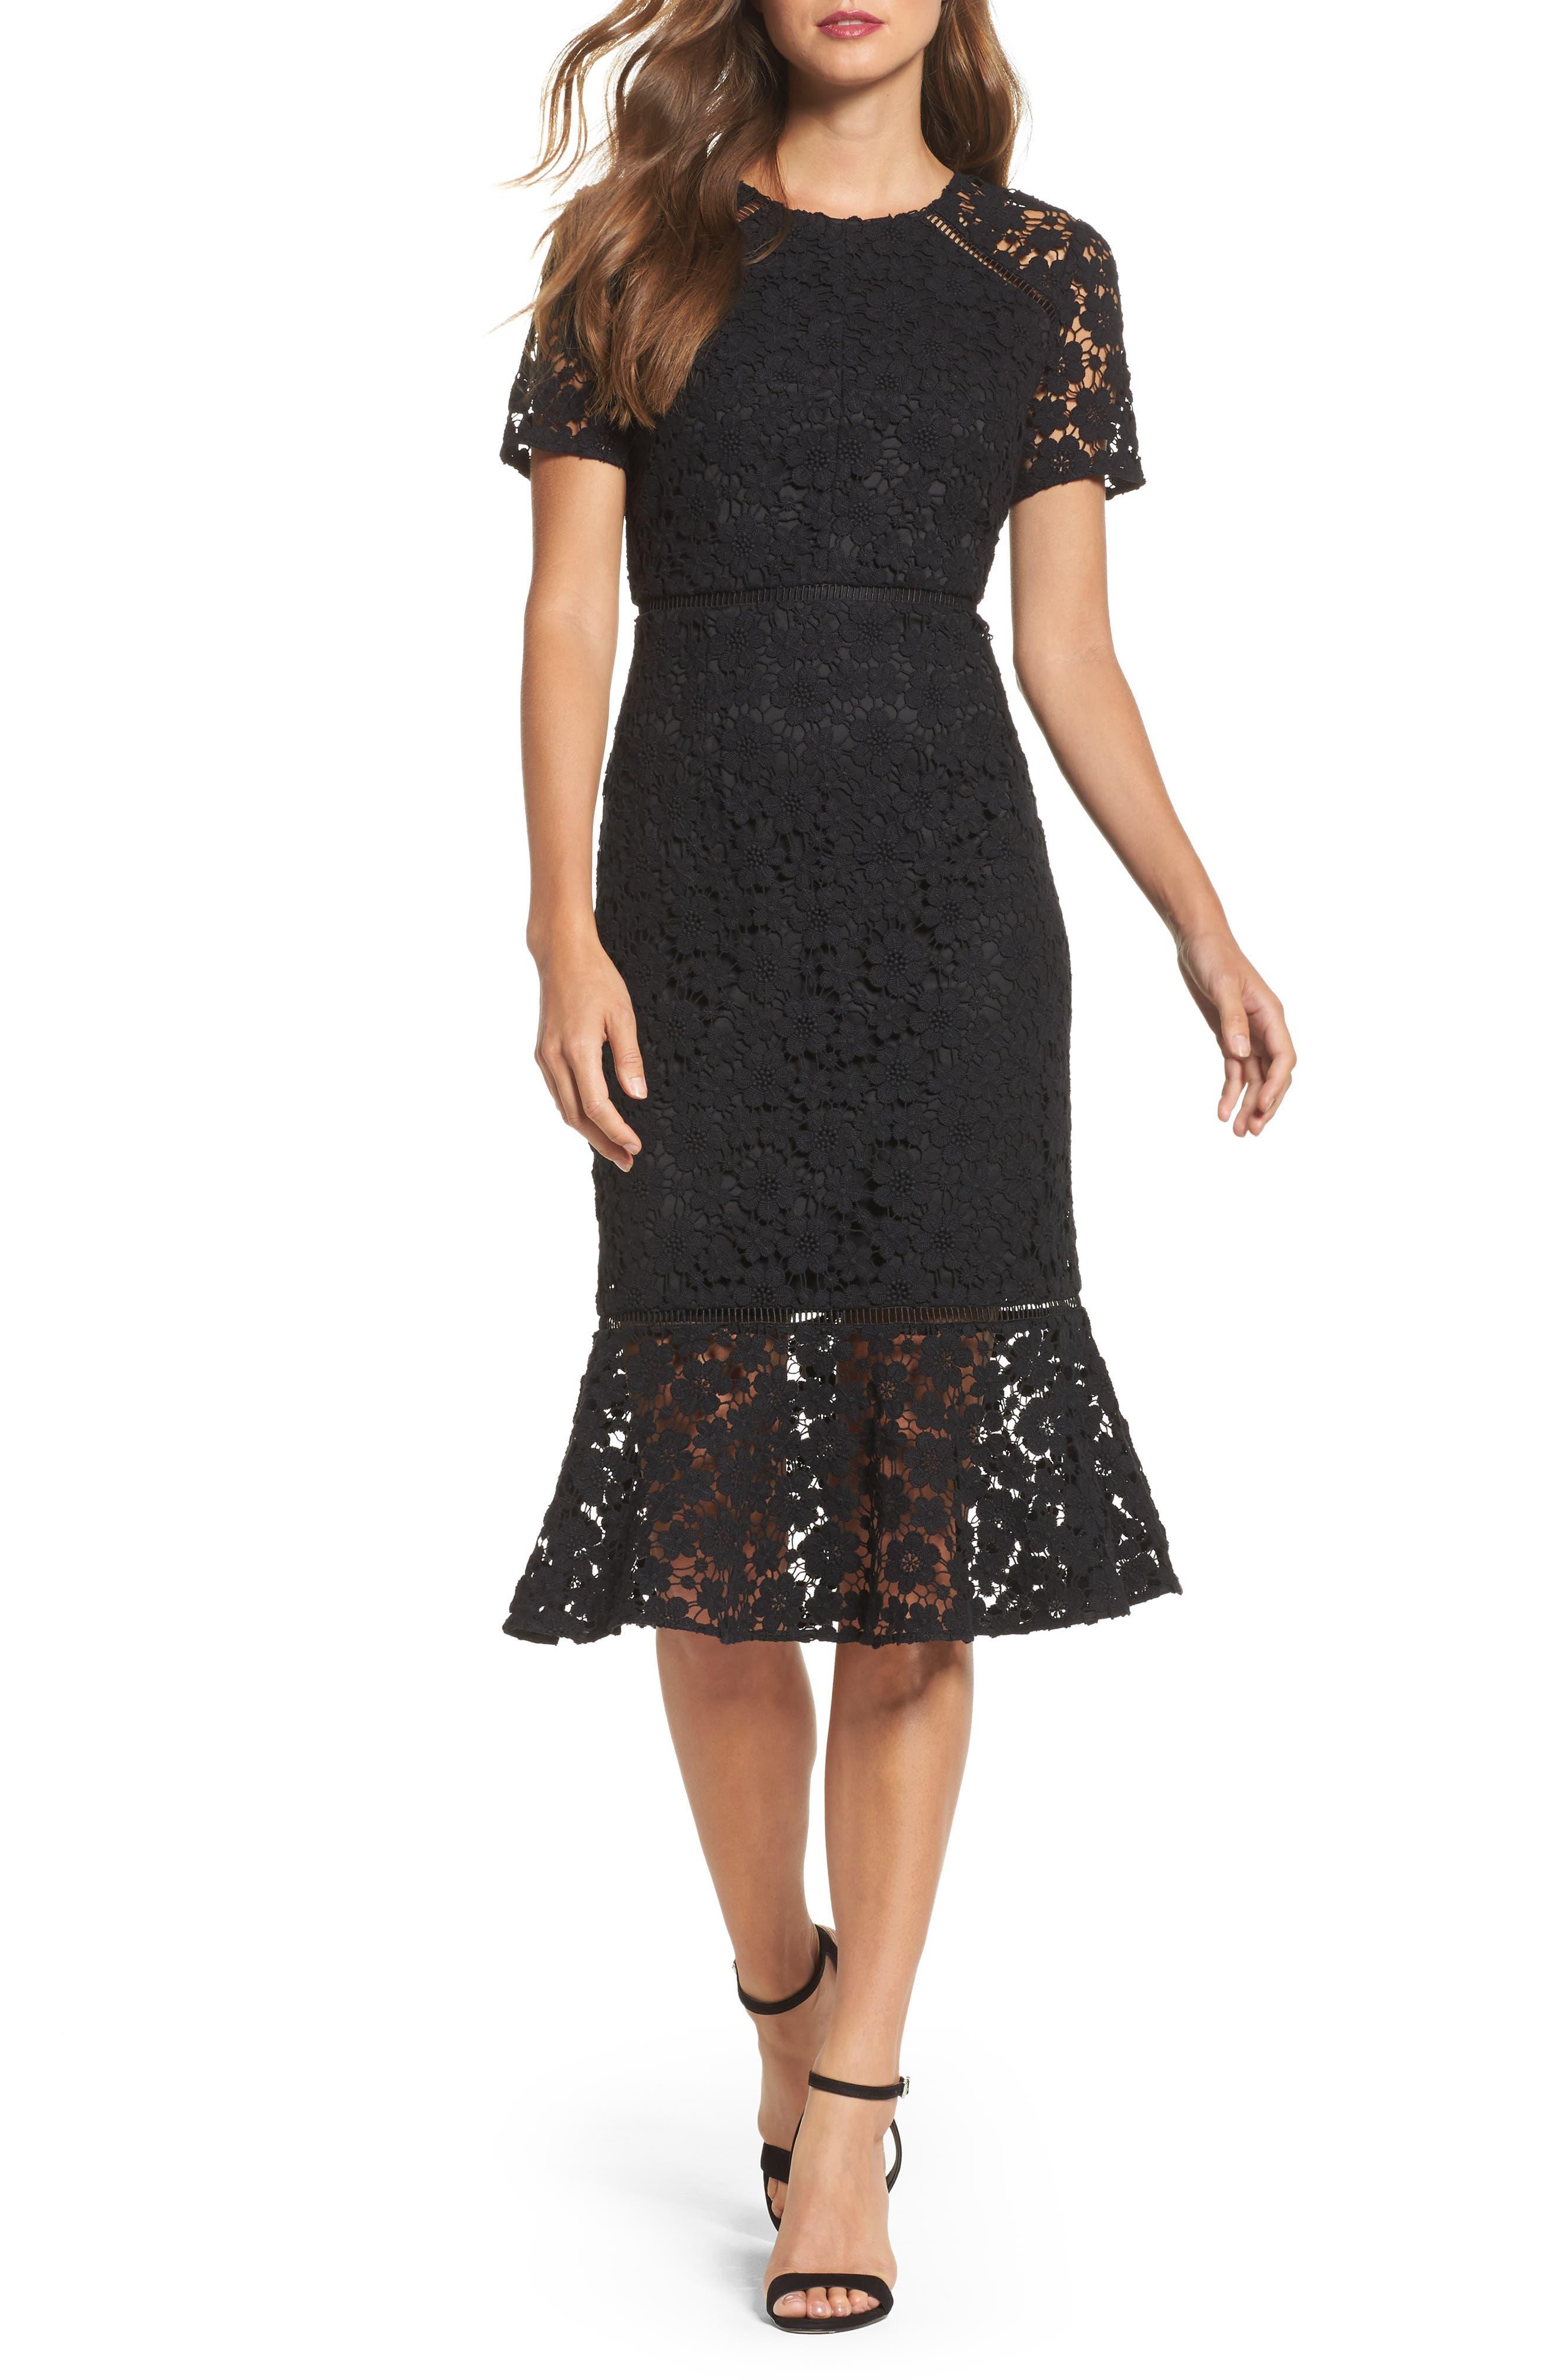 Shoshanna Octavia Lace Sheath Dress